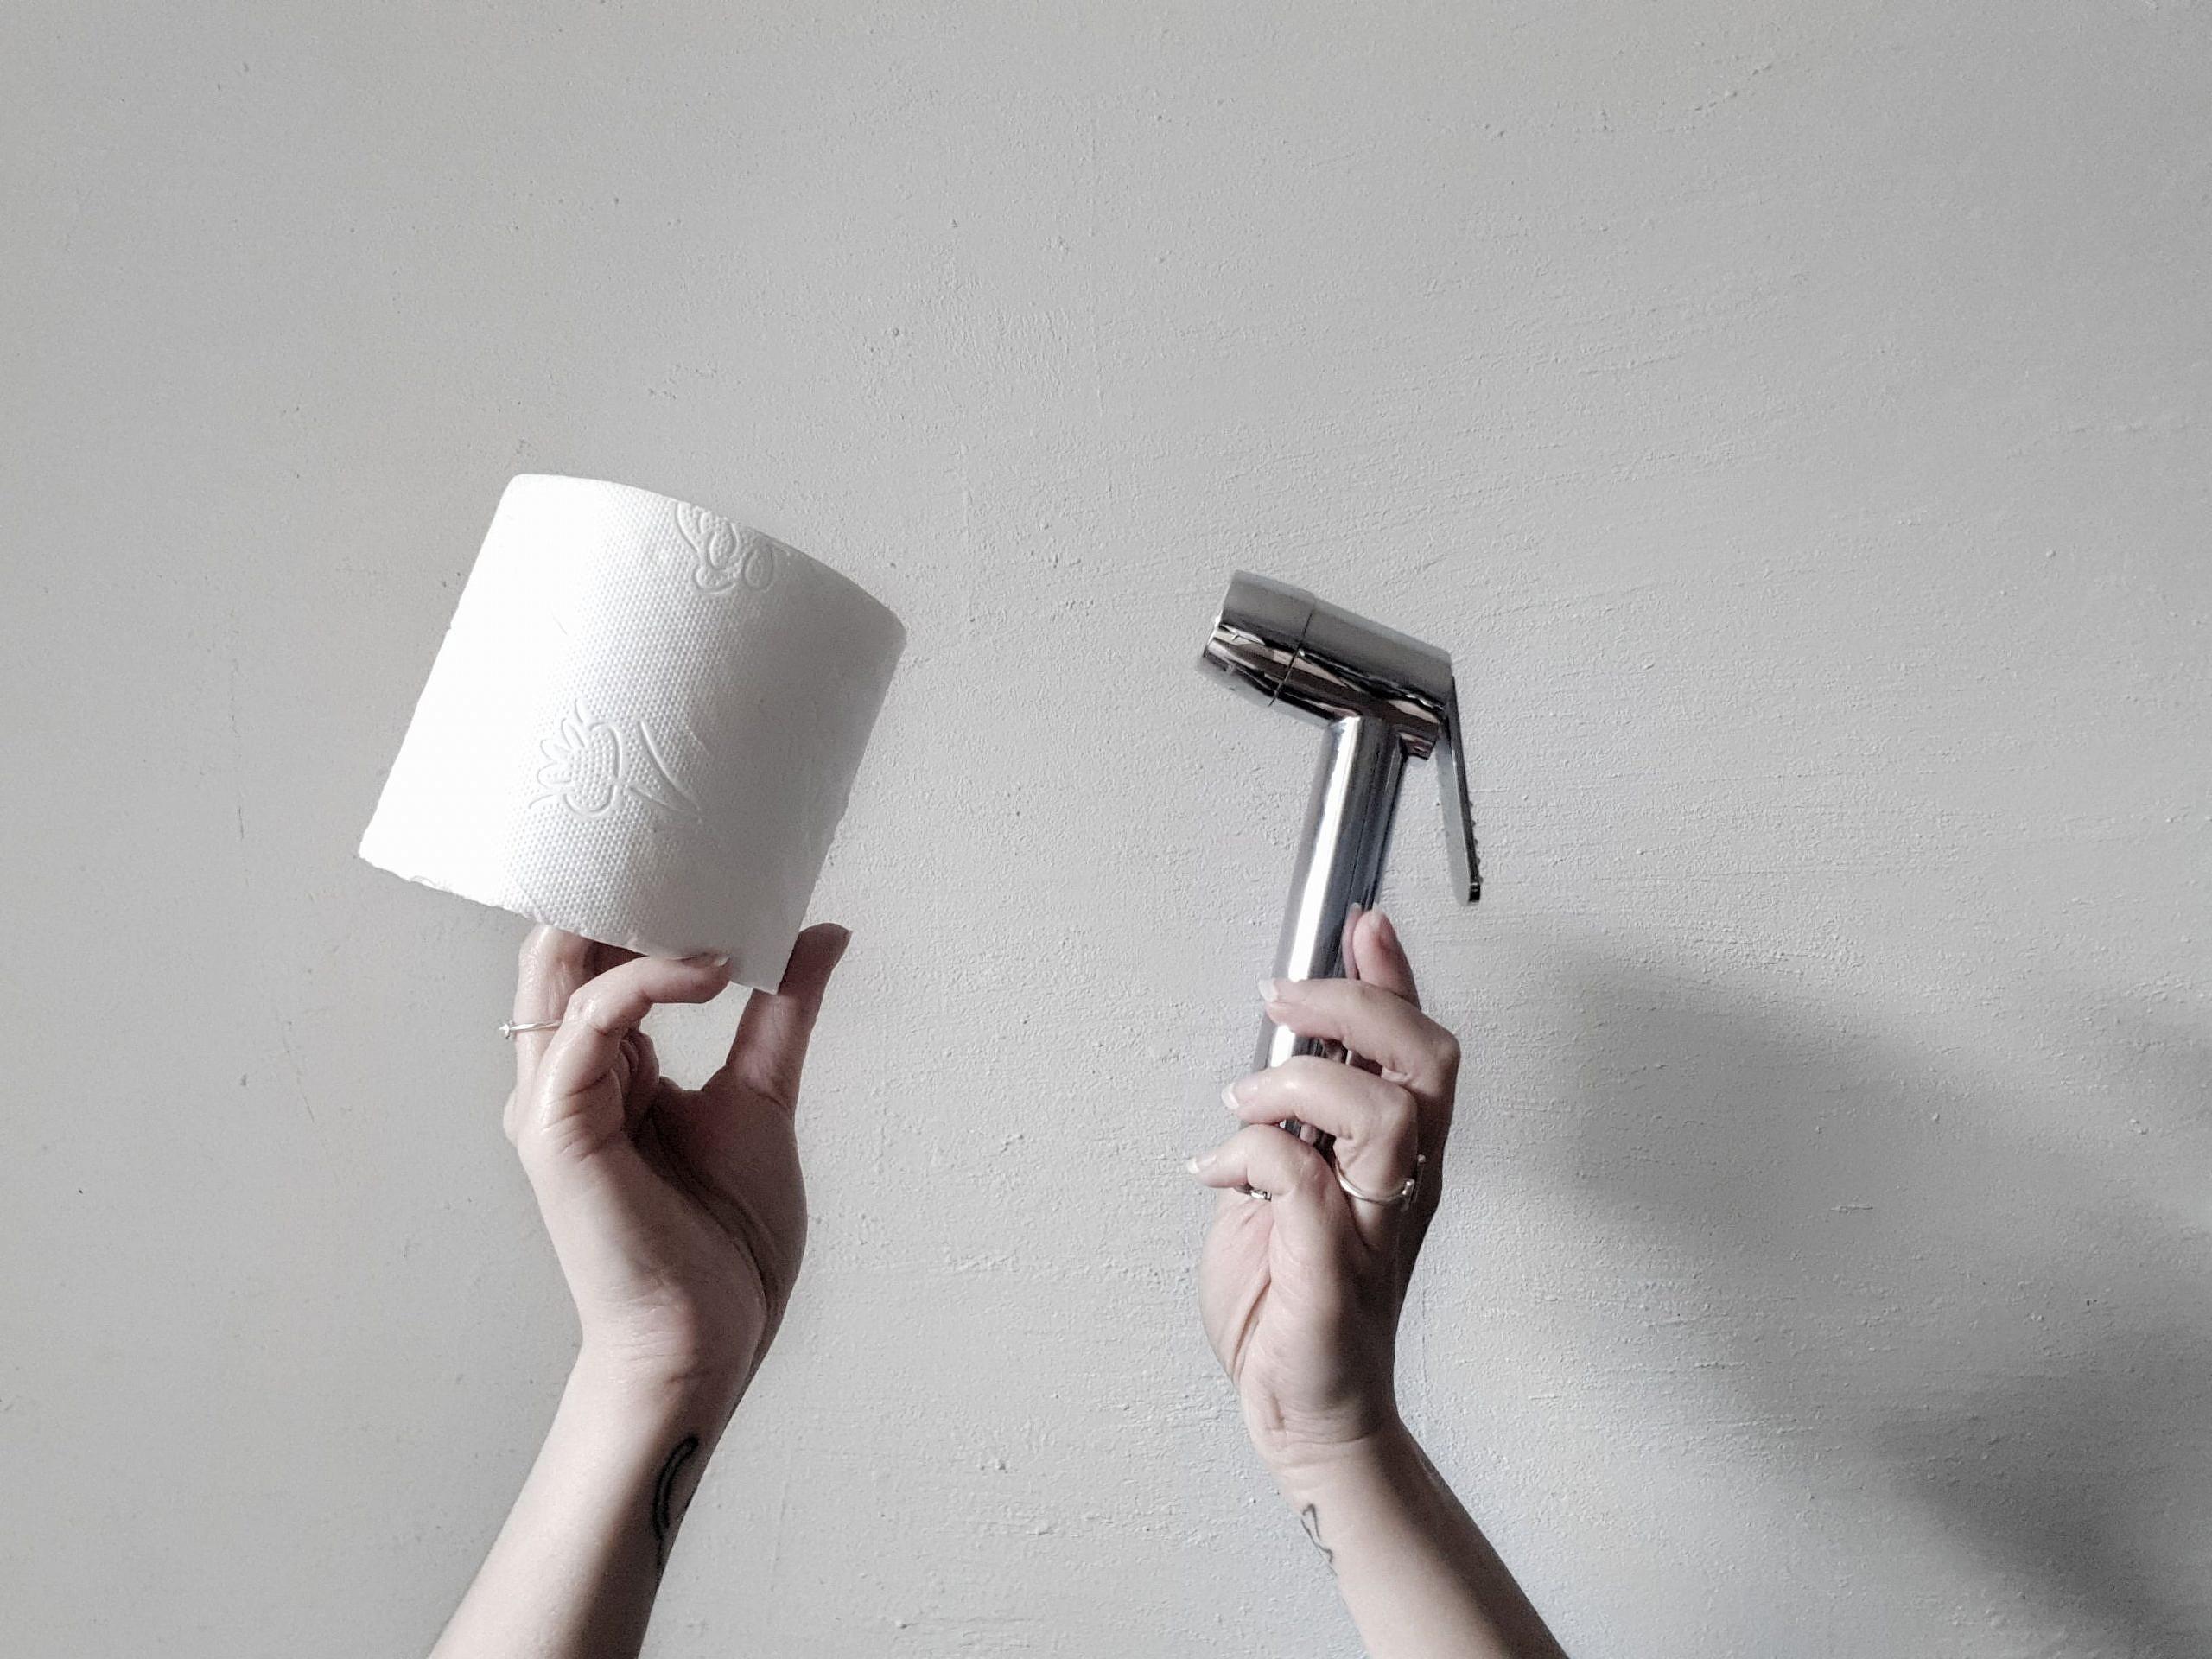 papier-toilette-vs-douchette